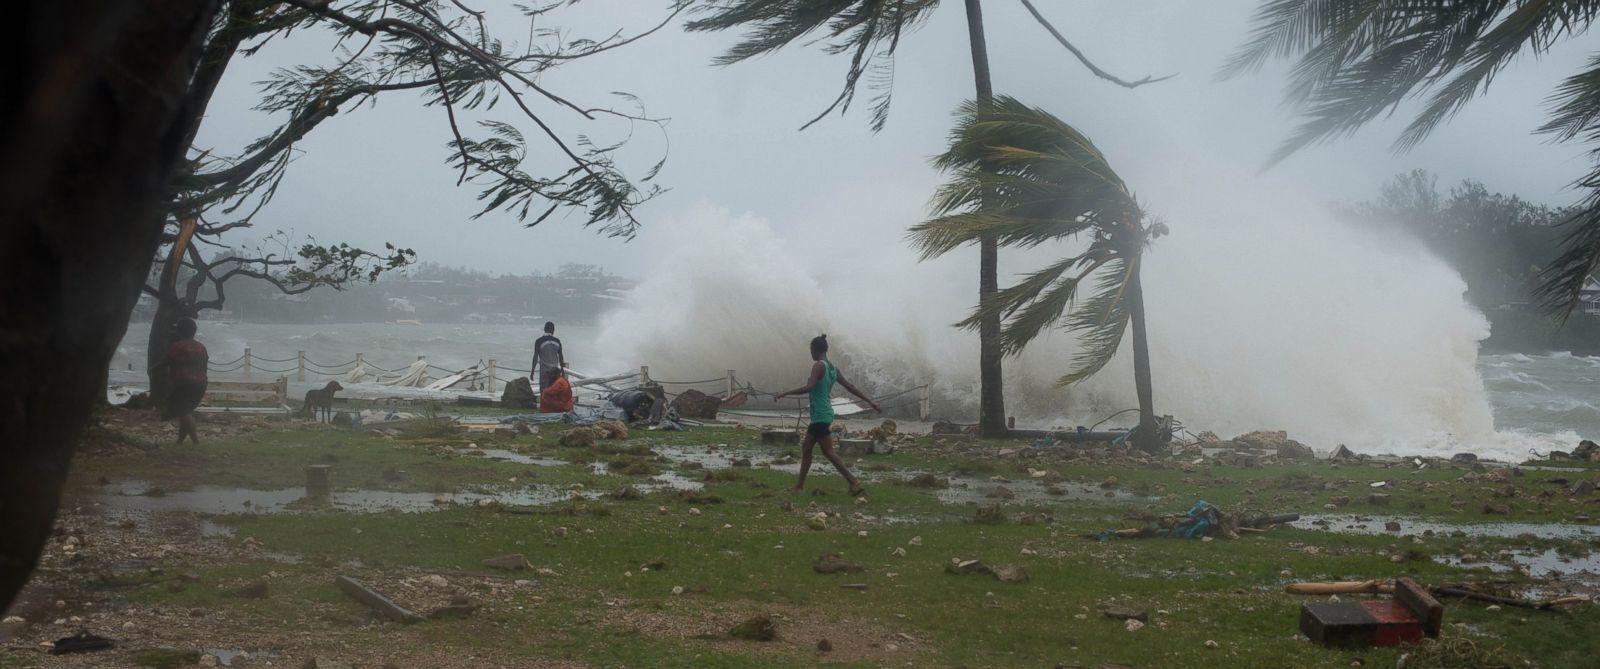 PHOTO: Waves crash along the coastline in Port Vila, Vanuatu, March 14, 2015.